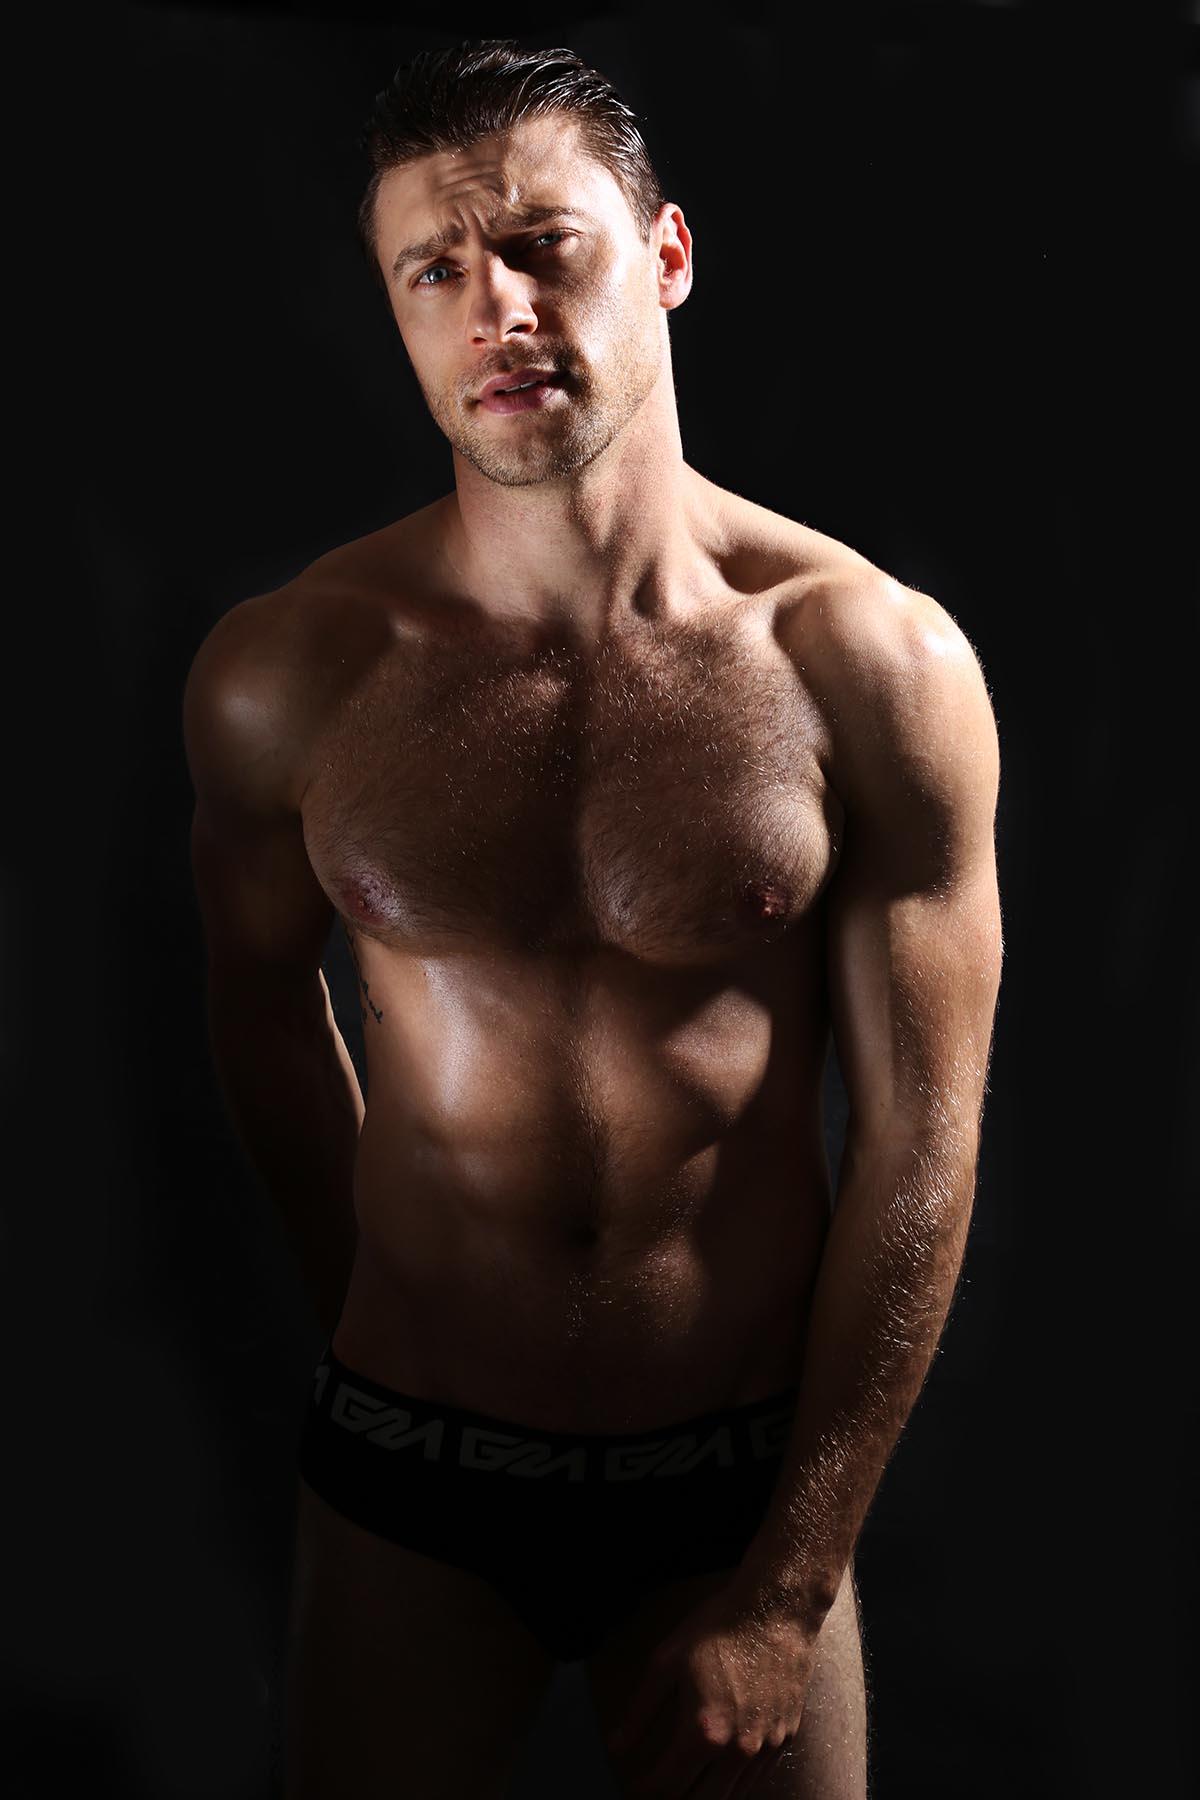 Vinicius Piccoli by Karim Konrad for Brazilian Male Model